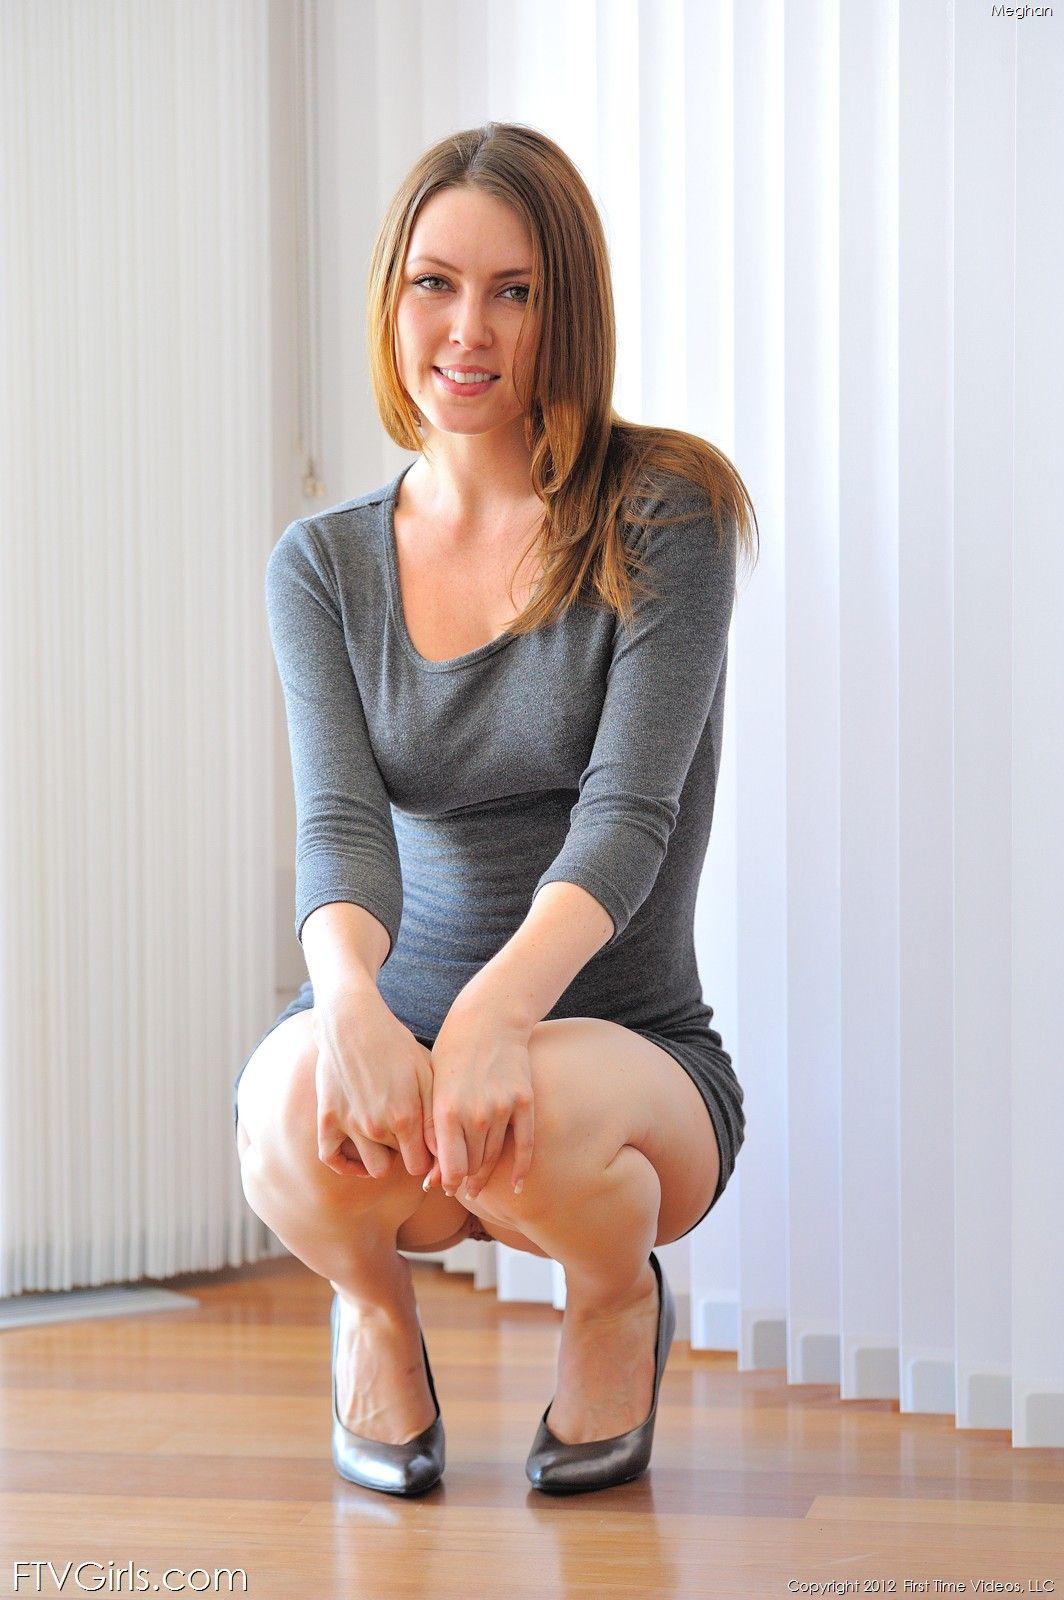 Jessica kingham topless